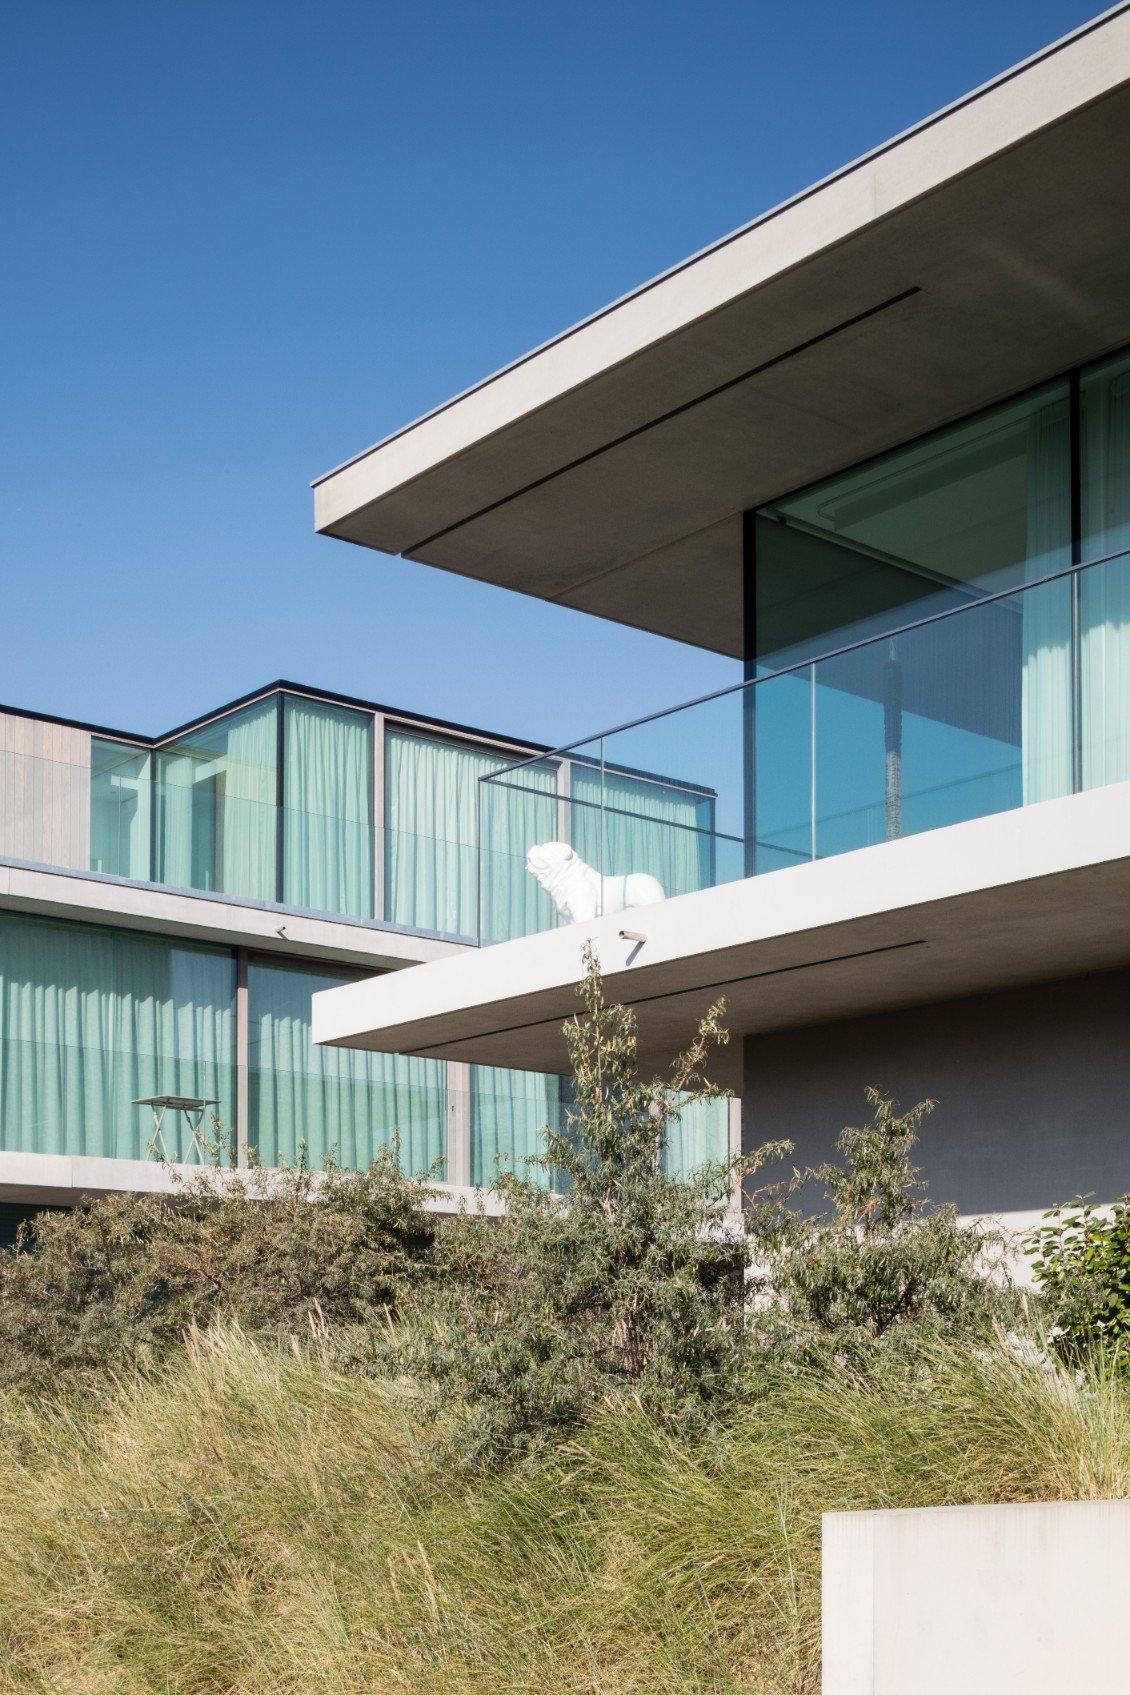 Rietveldprojects.be-Twins-Gropius-Breuer-appartement-design-architectuur-kust12.jpg